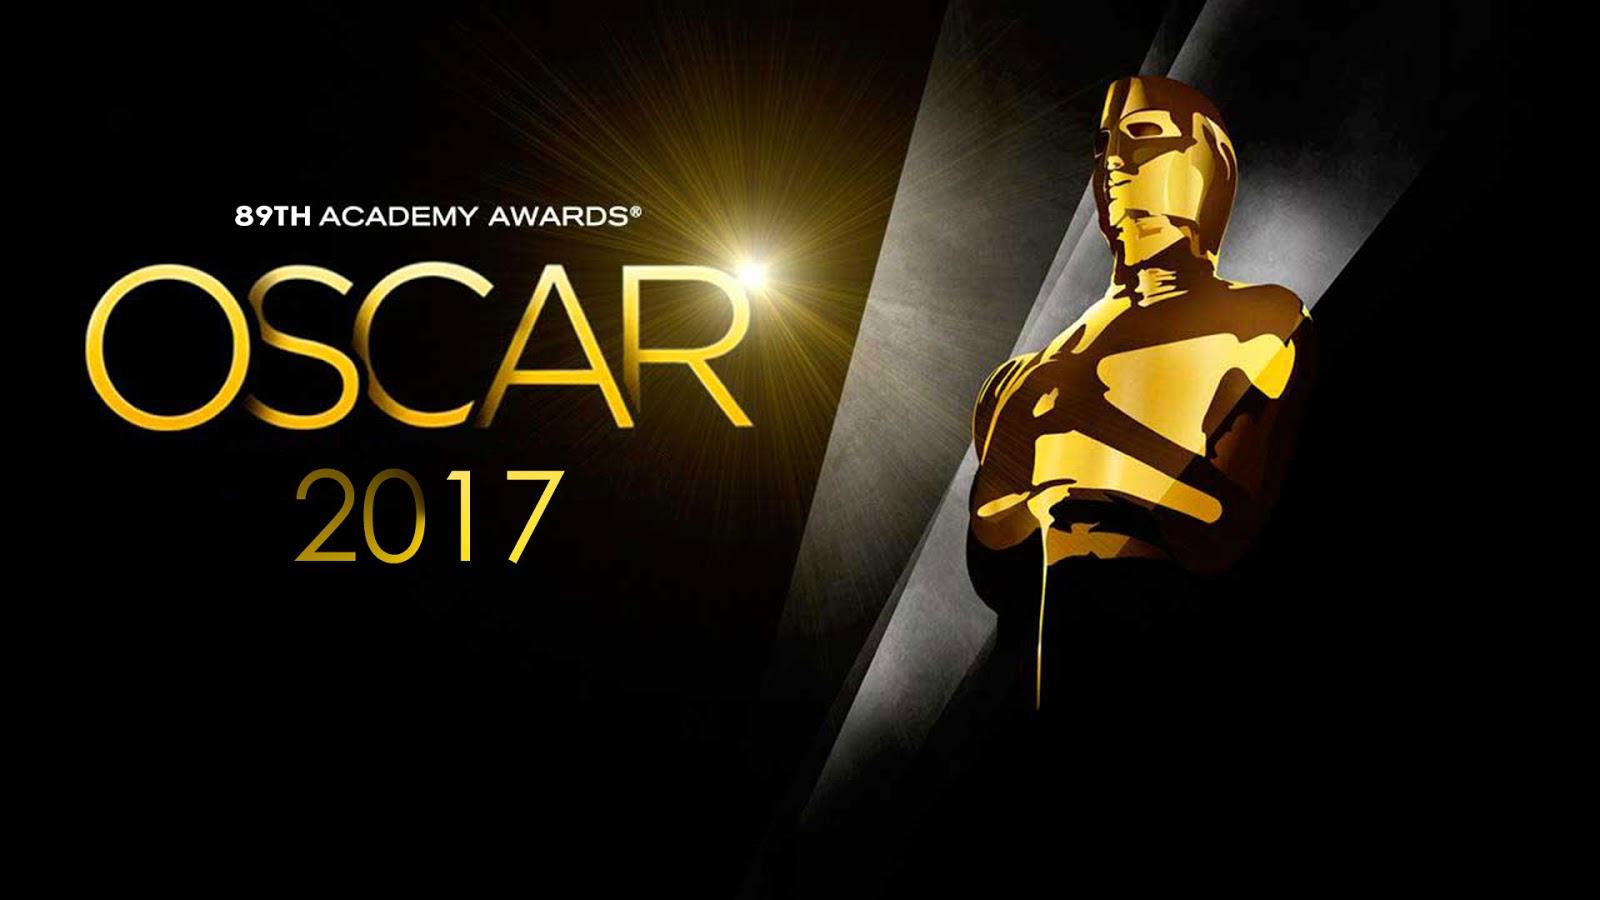 Oscars 2017 academy awards nominations